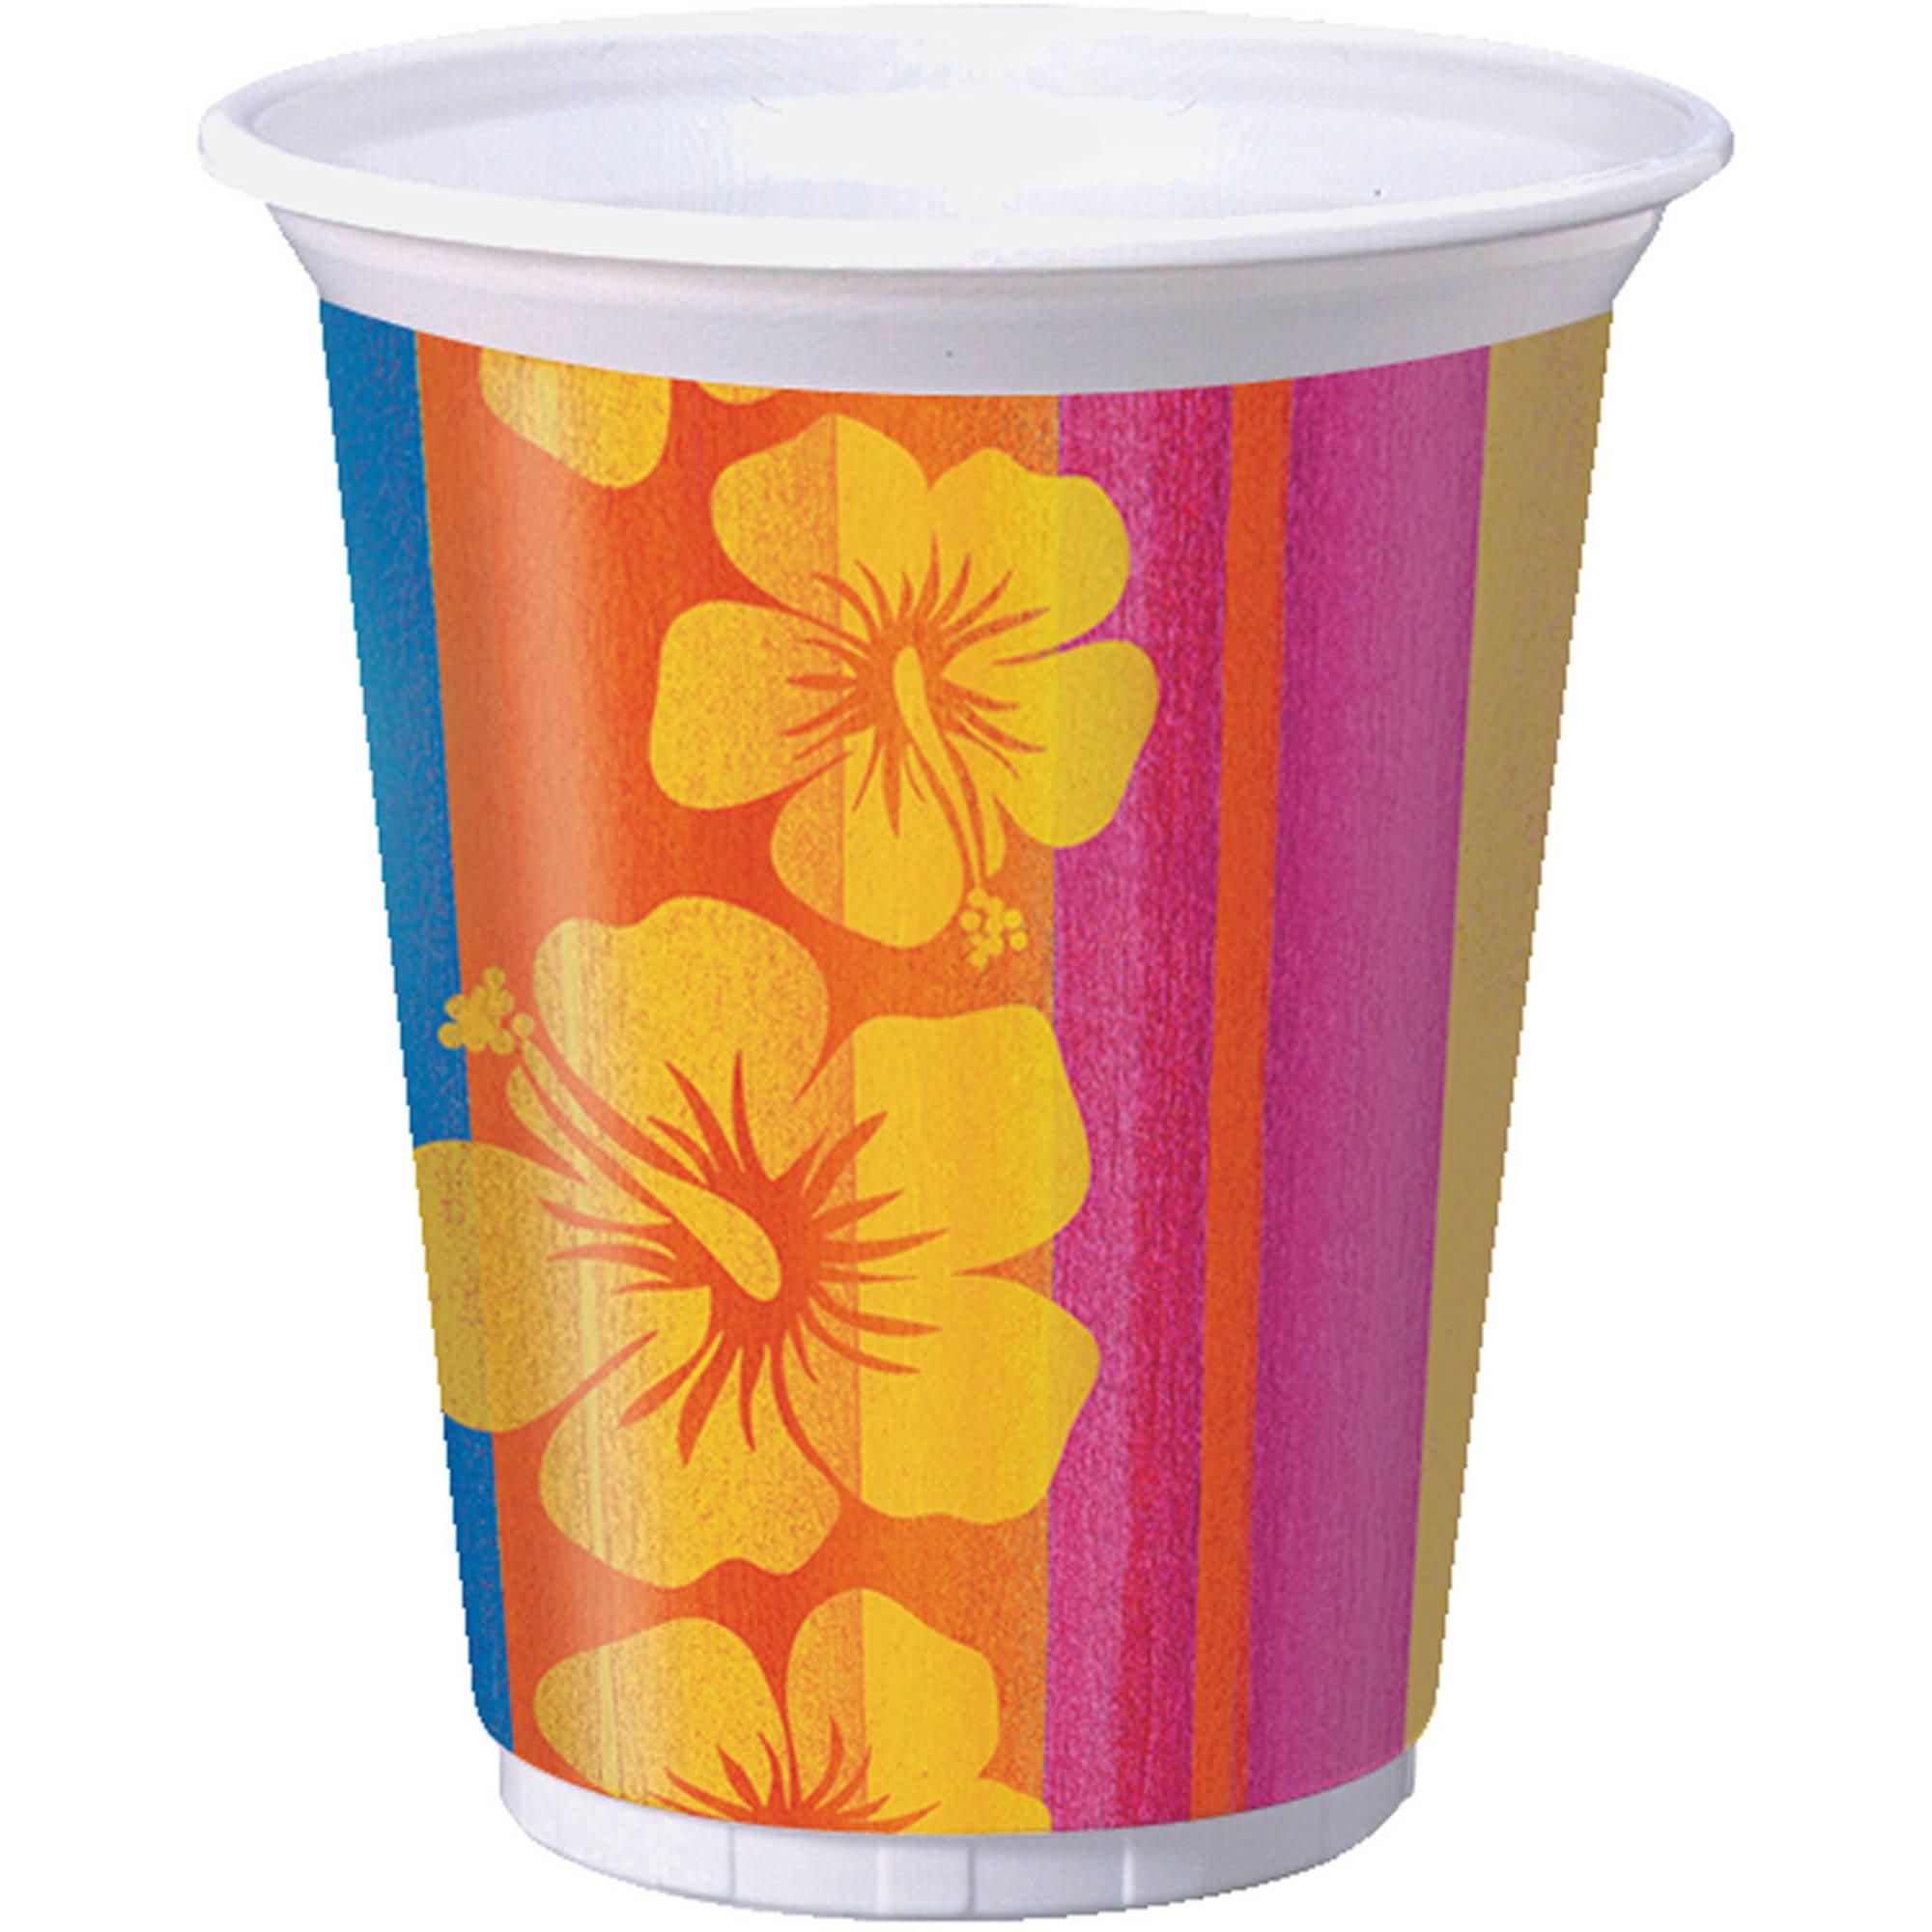 Sunset Stripes Printed Plastic Cup, 16 oz, 8pk